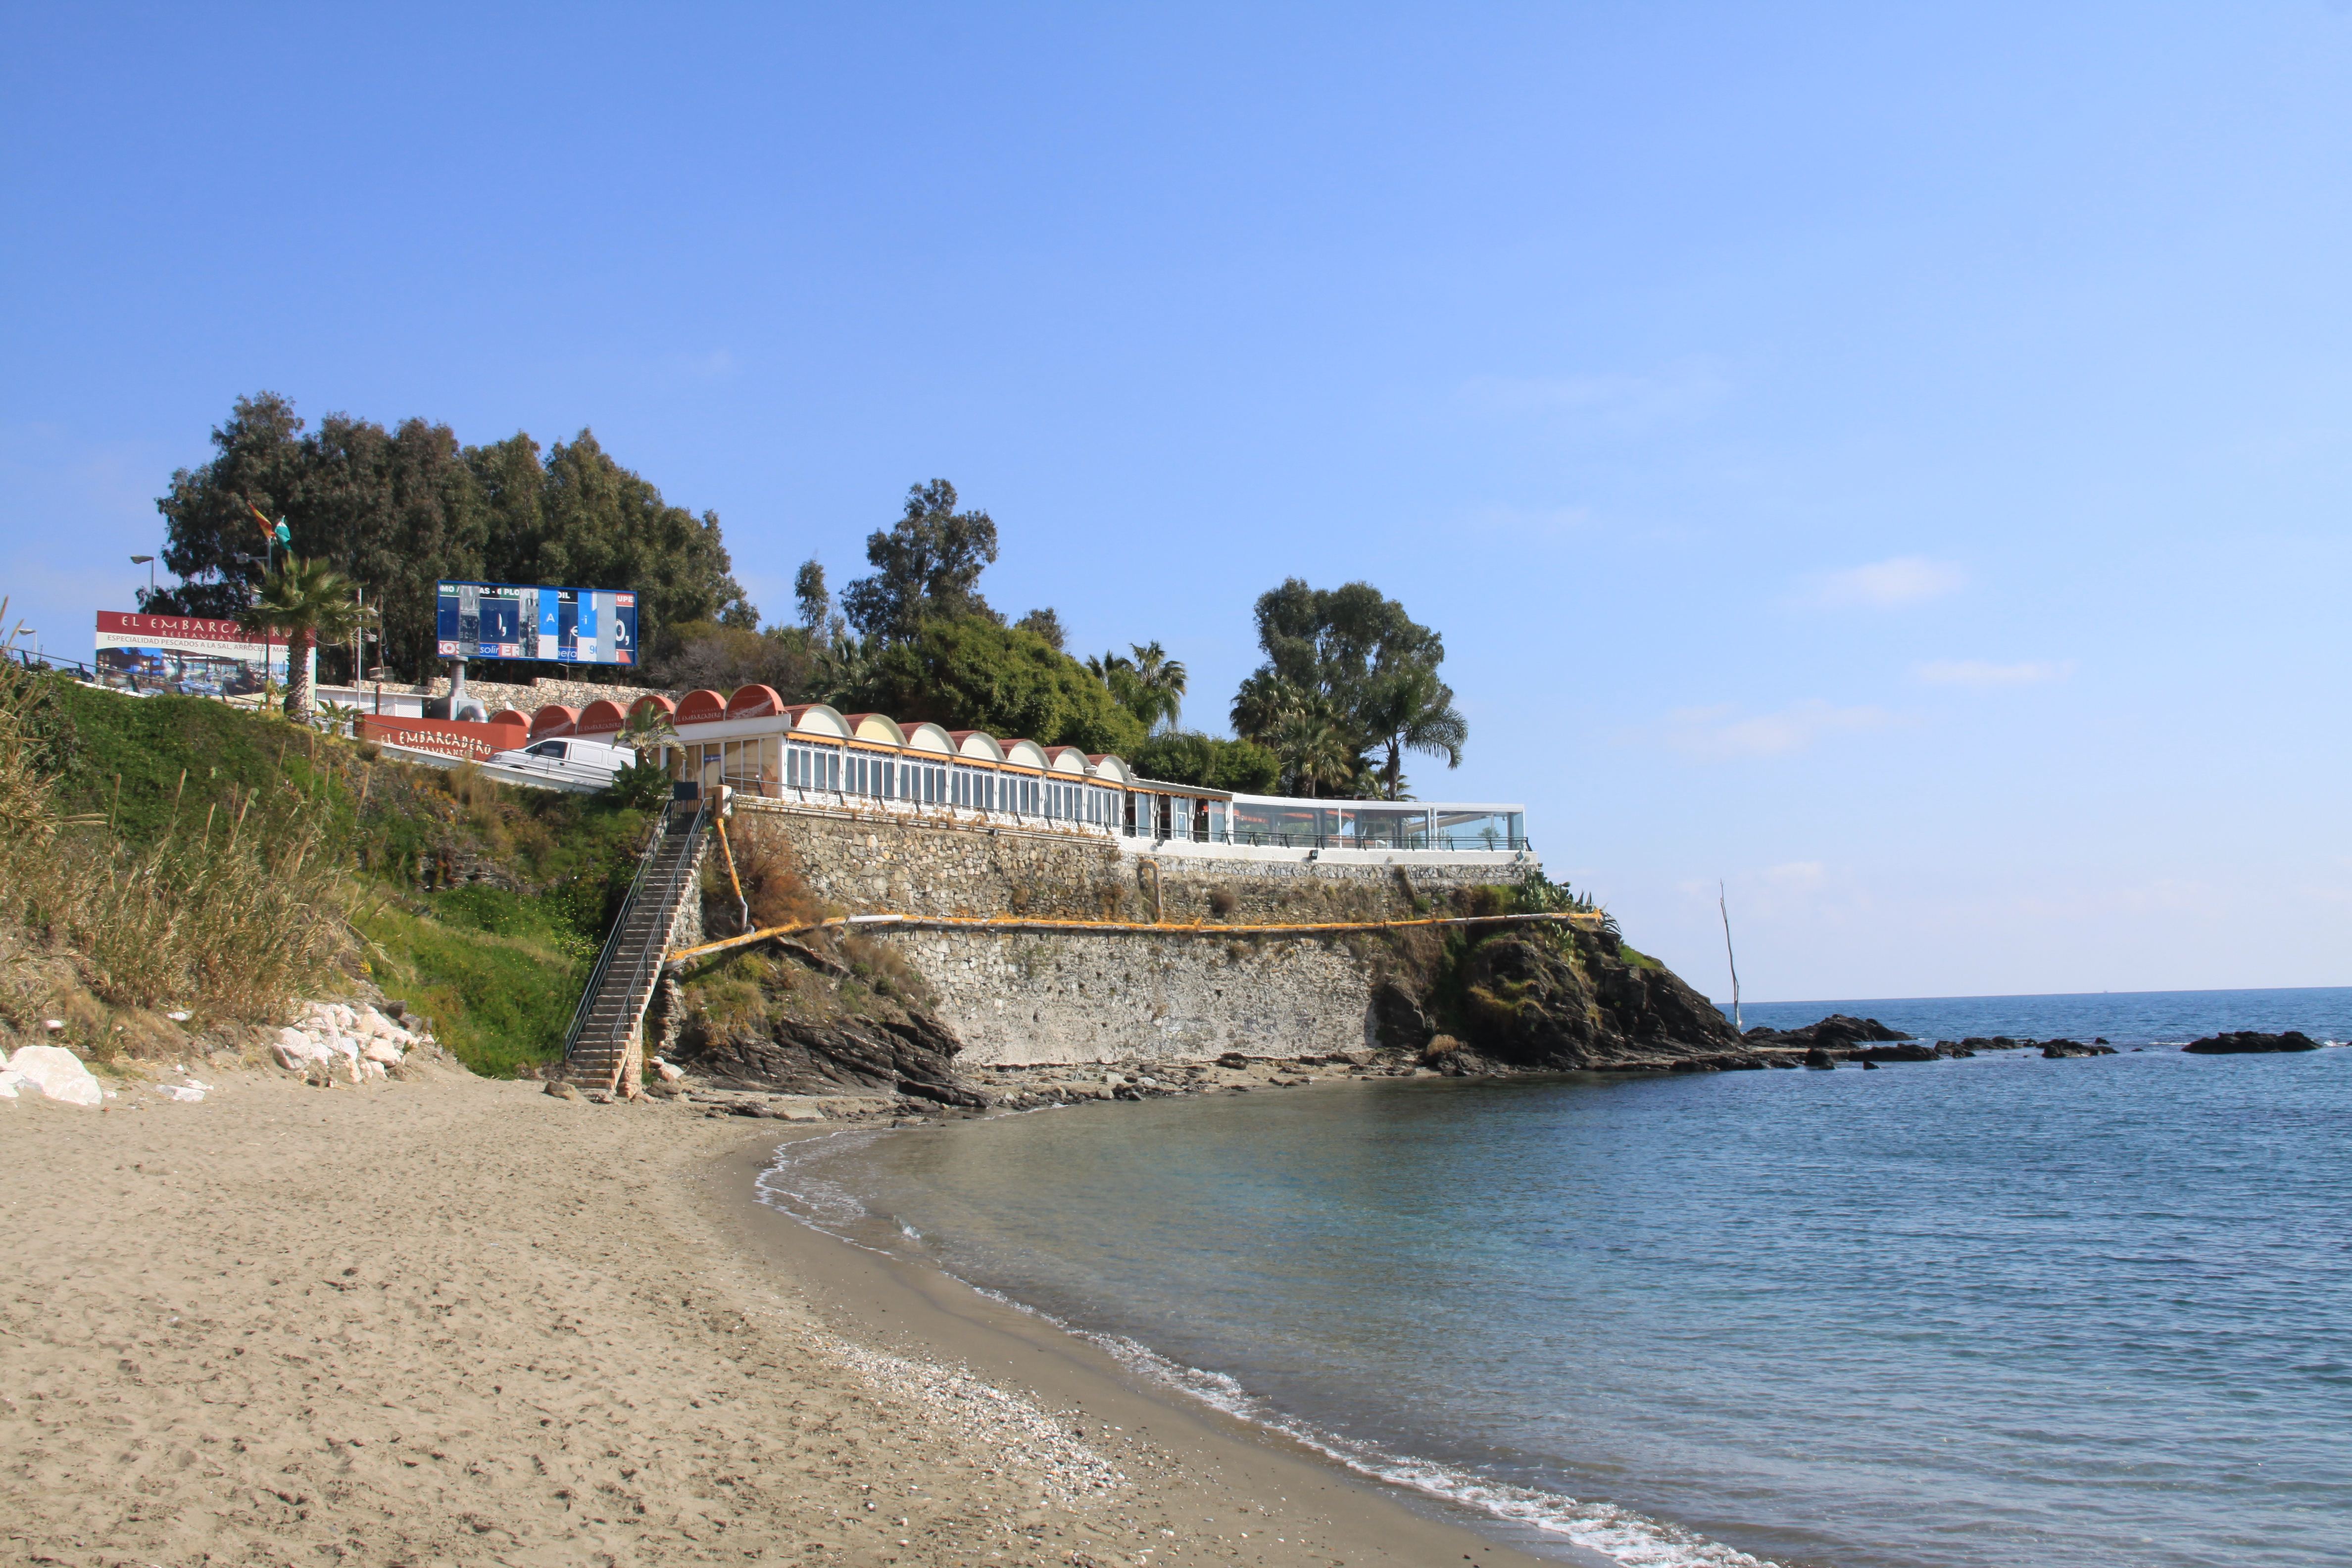 Costa Del Sol Water Park Hotel